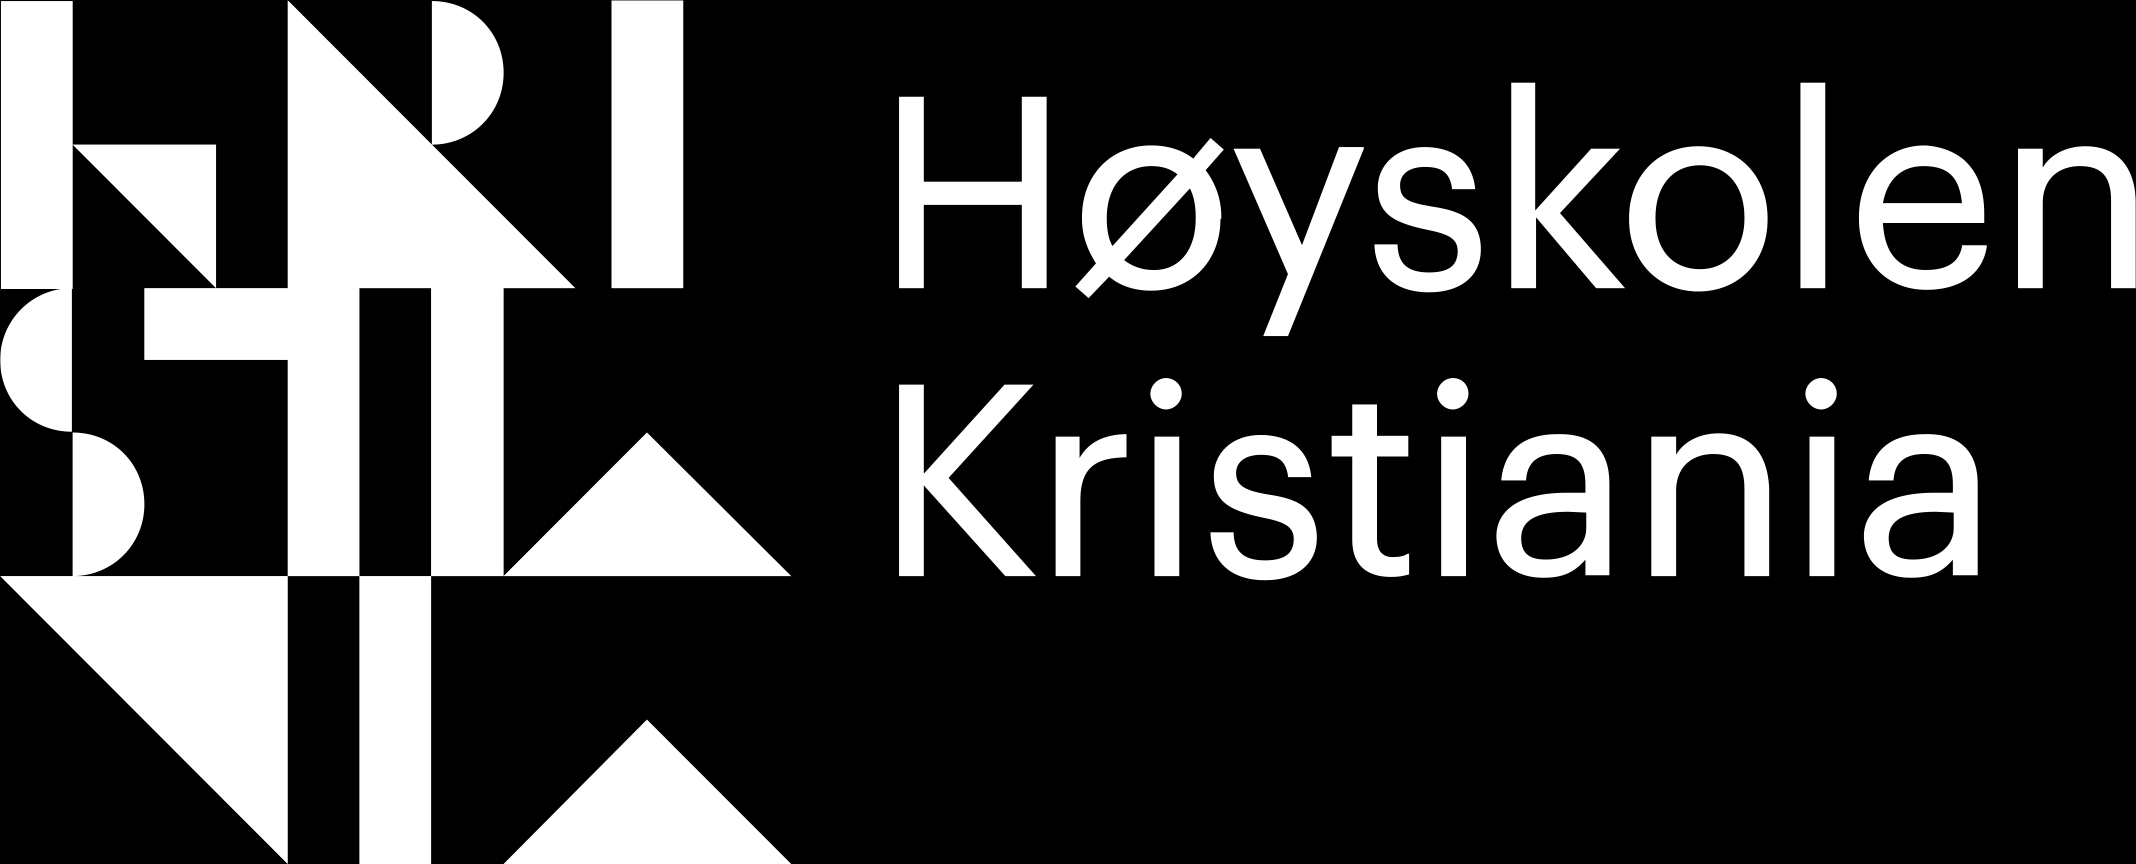 Word Høyskolen Kristiania